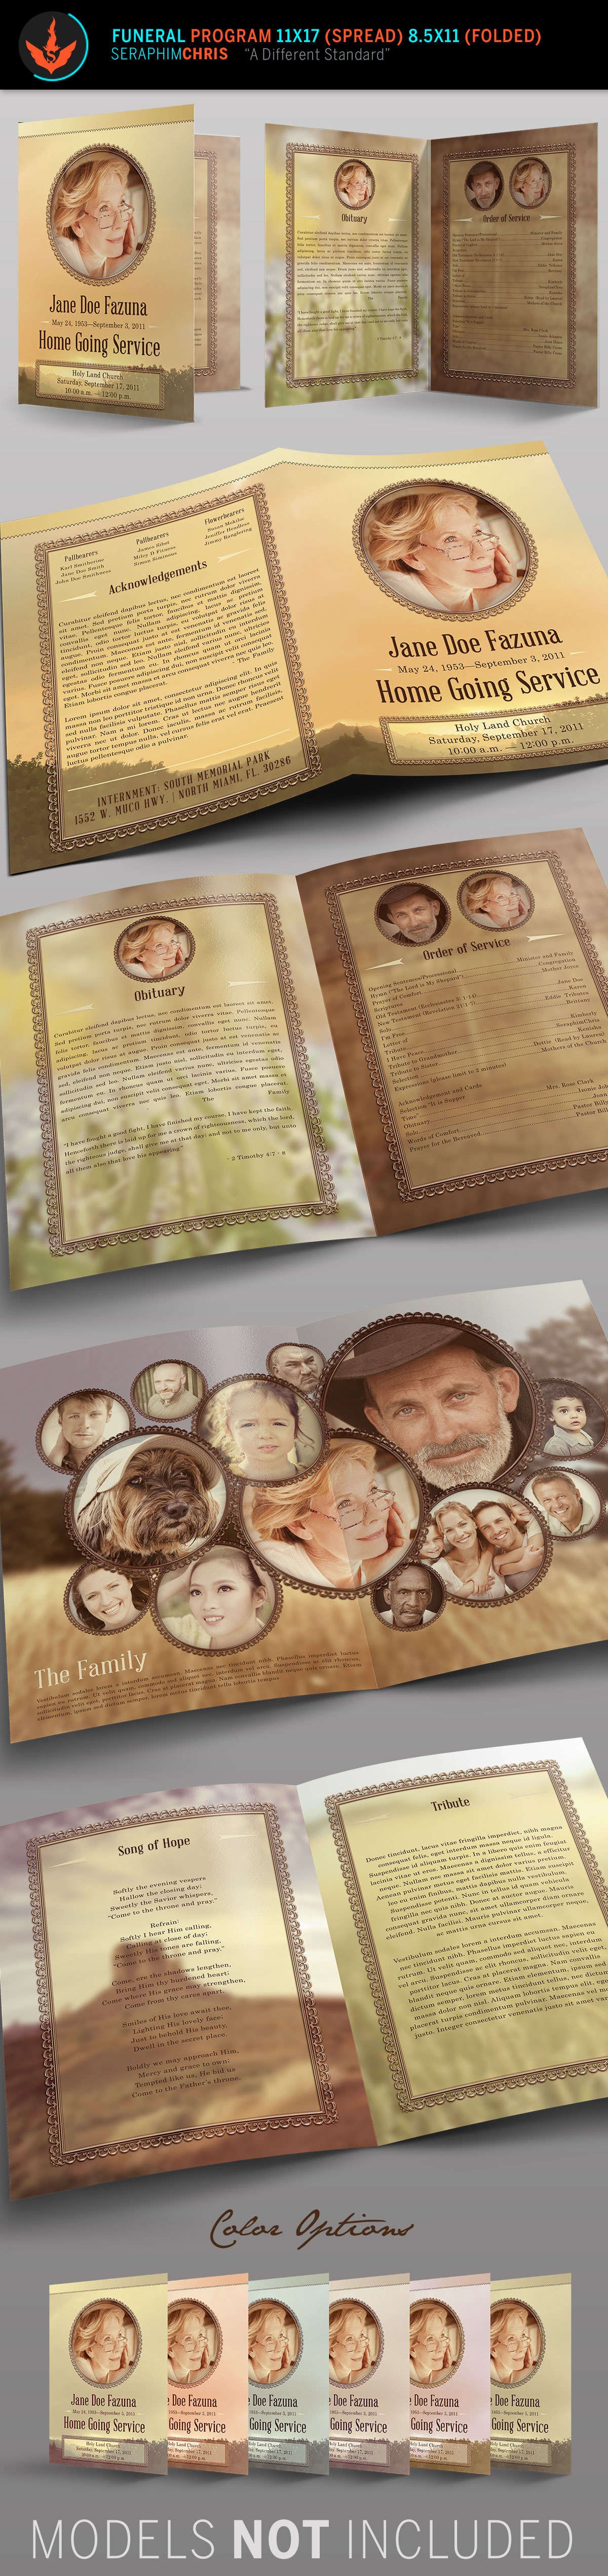 funeral program vintage Memorial honor Booklet contemporary country bulletin Multipurpose heaven spread brochure Legacy obituary tribute